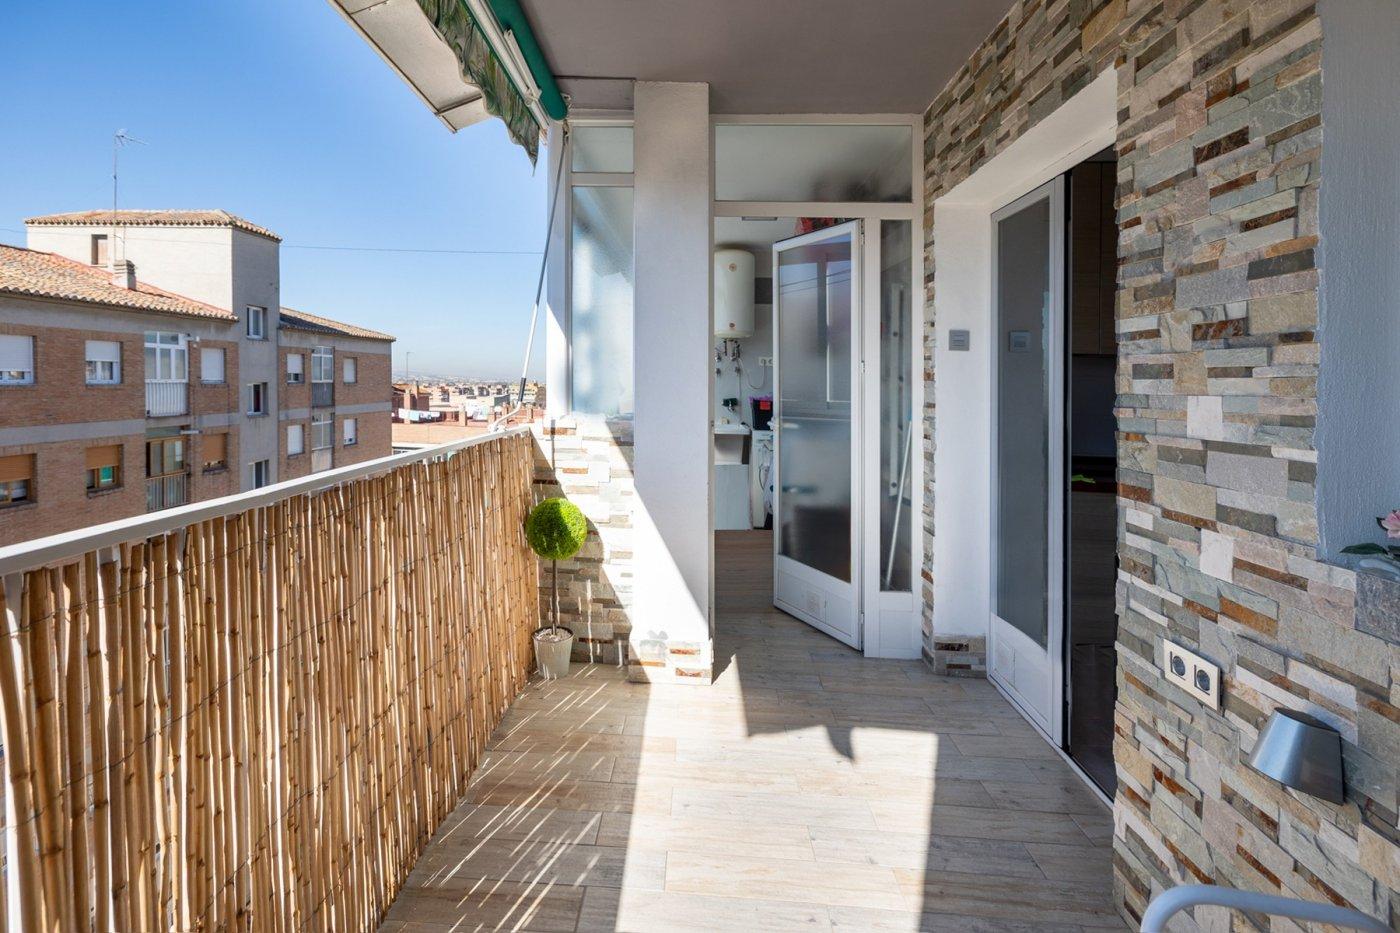 Avenida cadiz, piso en ultima planta con 3 dormitorios, un cuarto de baño.  balcon terraza